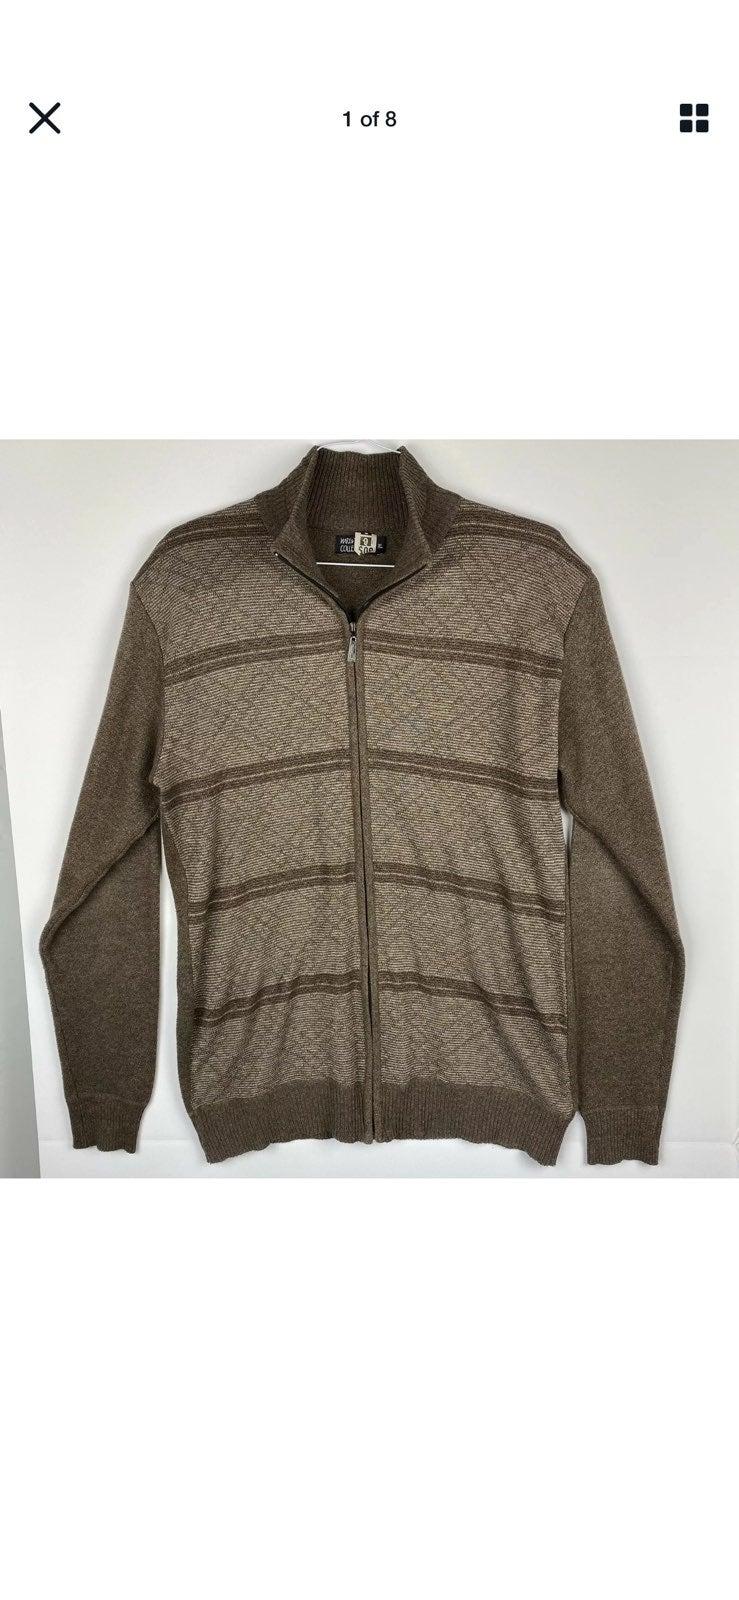 Marx and Dutch Medium Full Zip Sweater